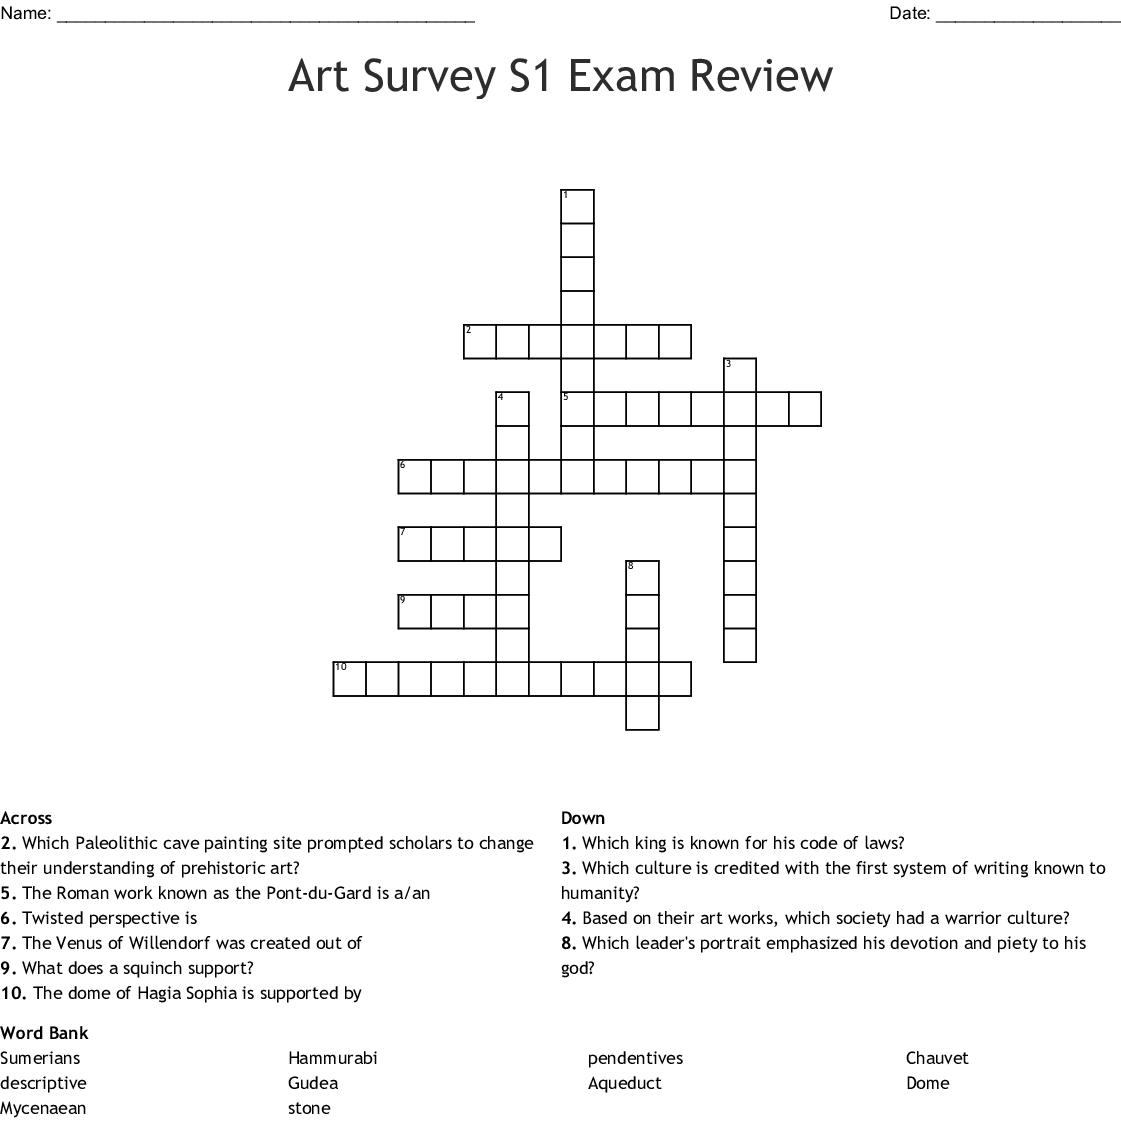 Art Survey S1 Exam Review Crossword